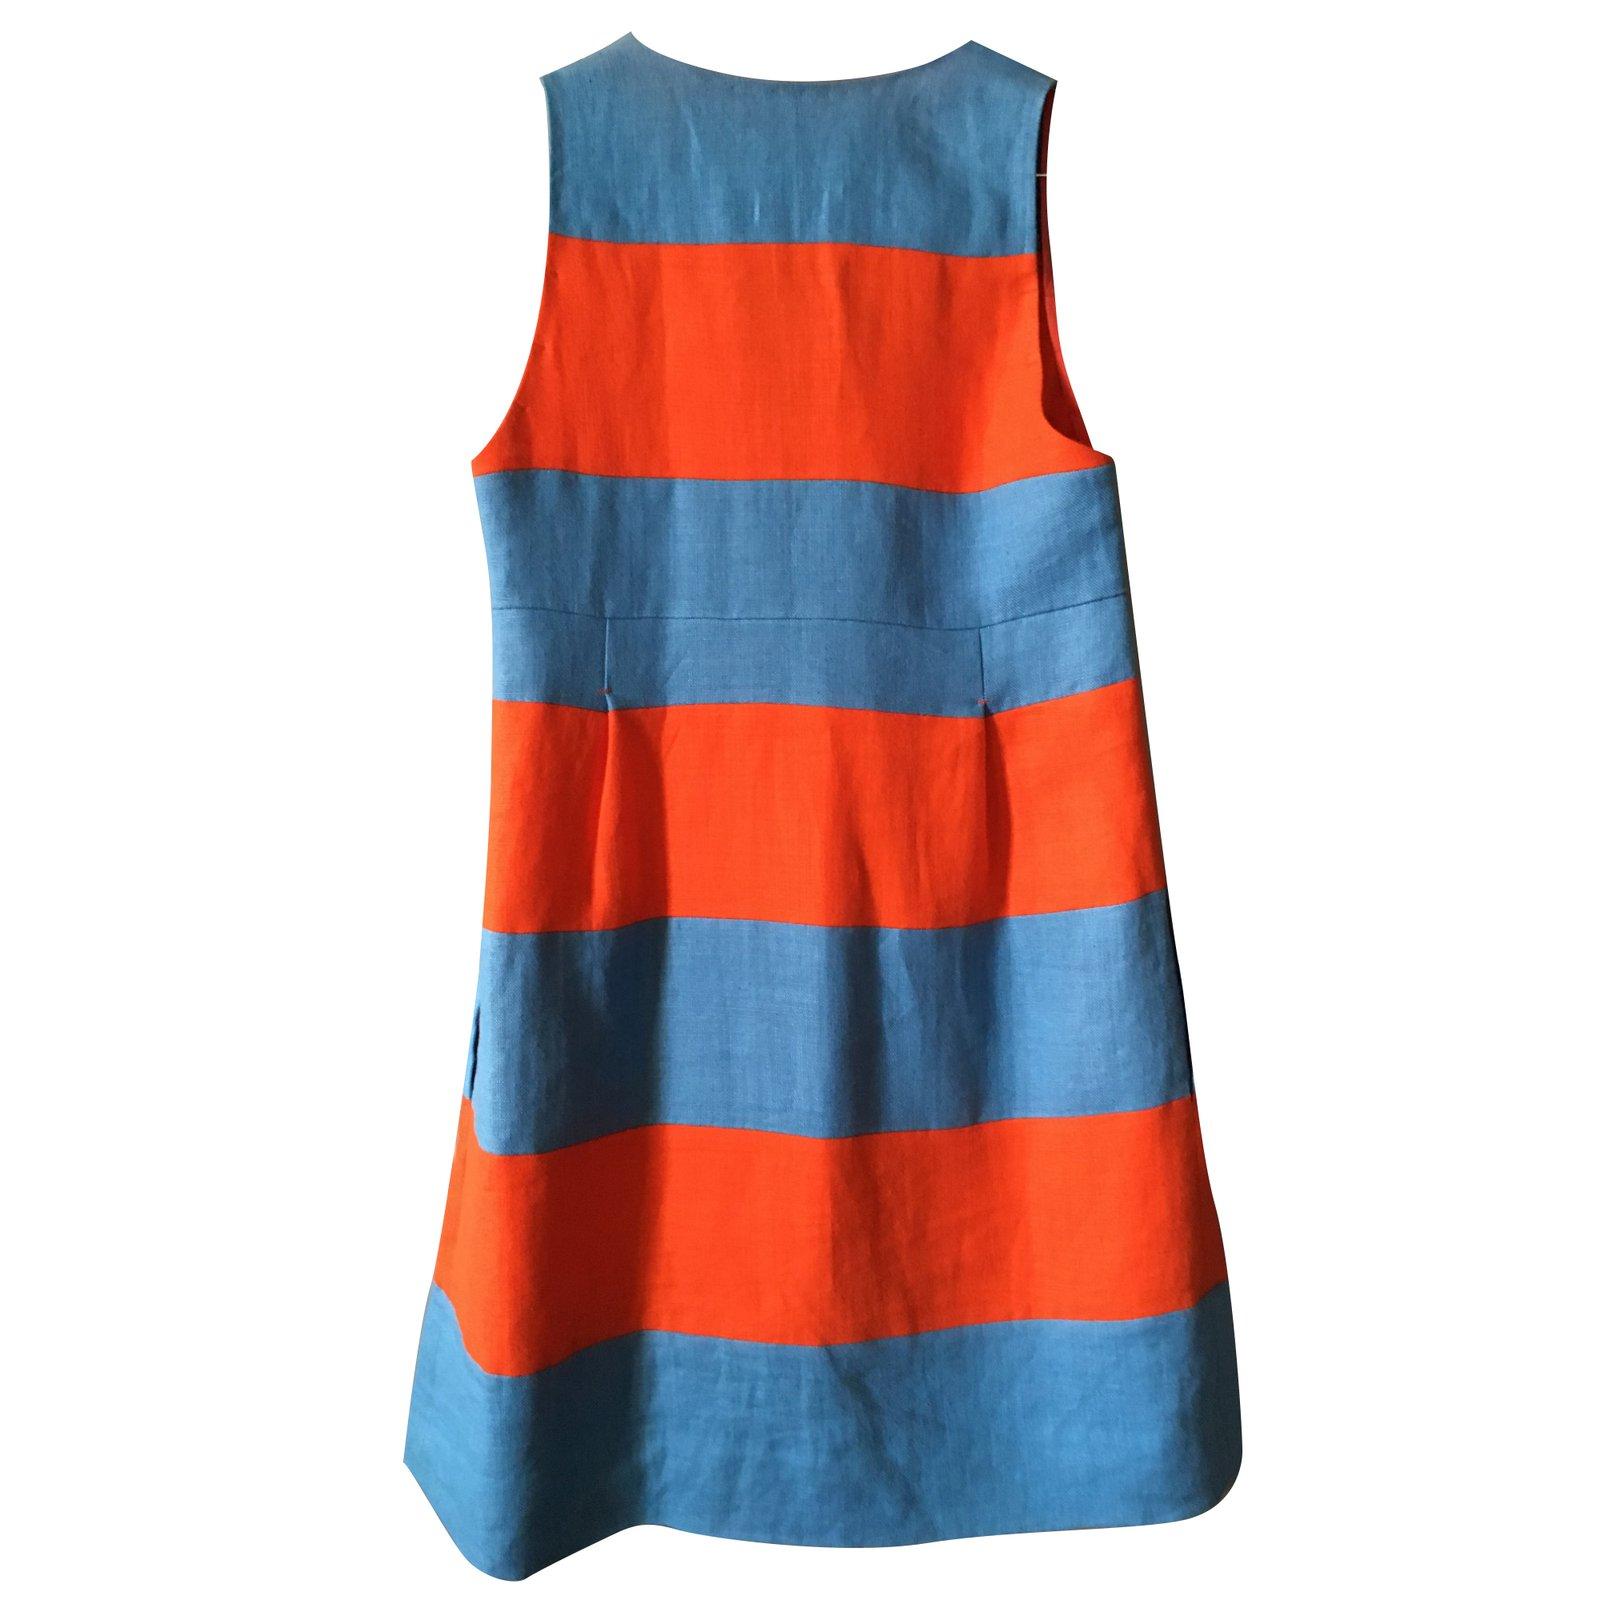 27c7e2a5851 Sonia By Sonia Rykiel Sonia Rykiel orange and blue striped linen ...